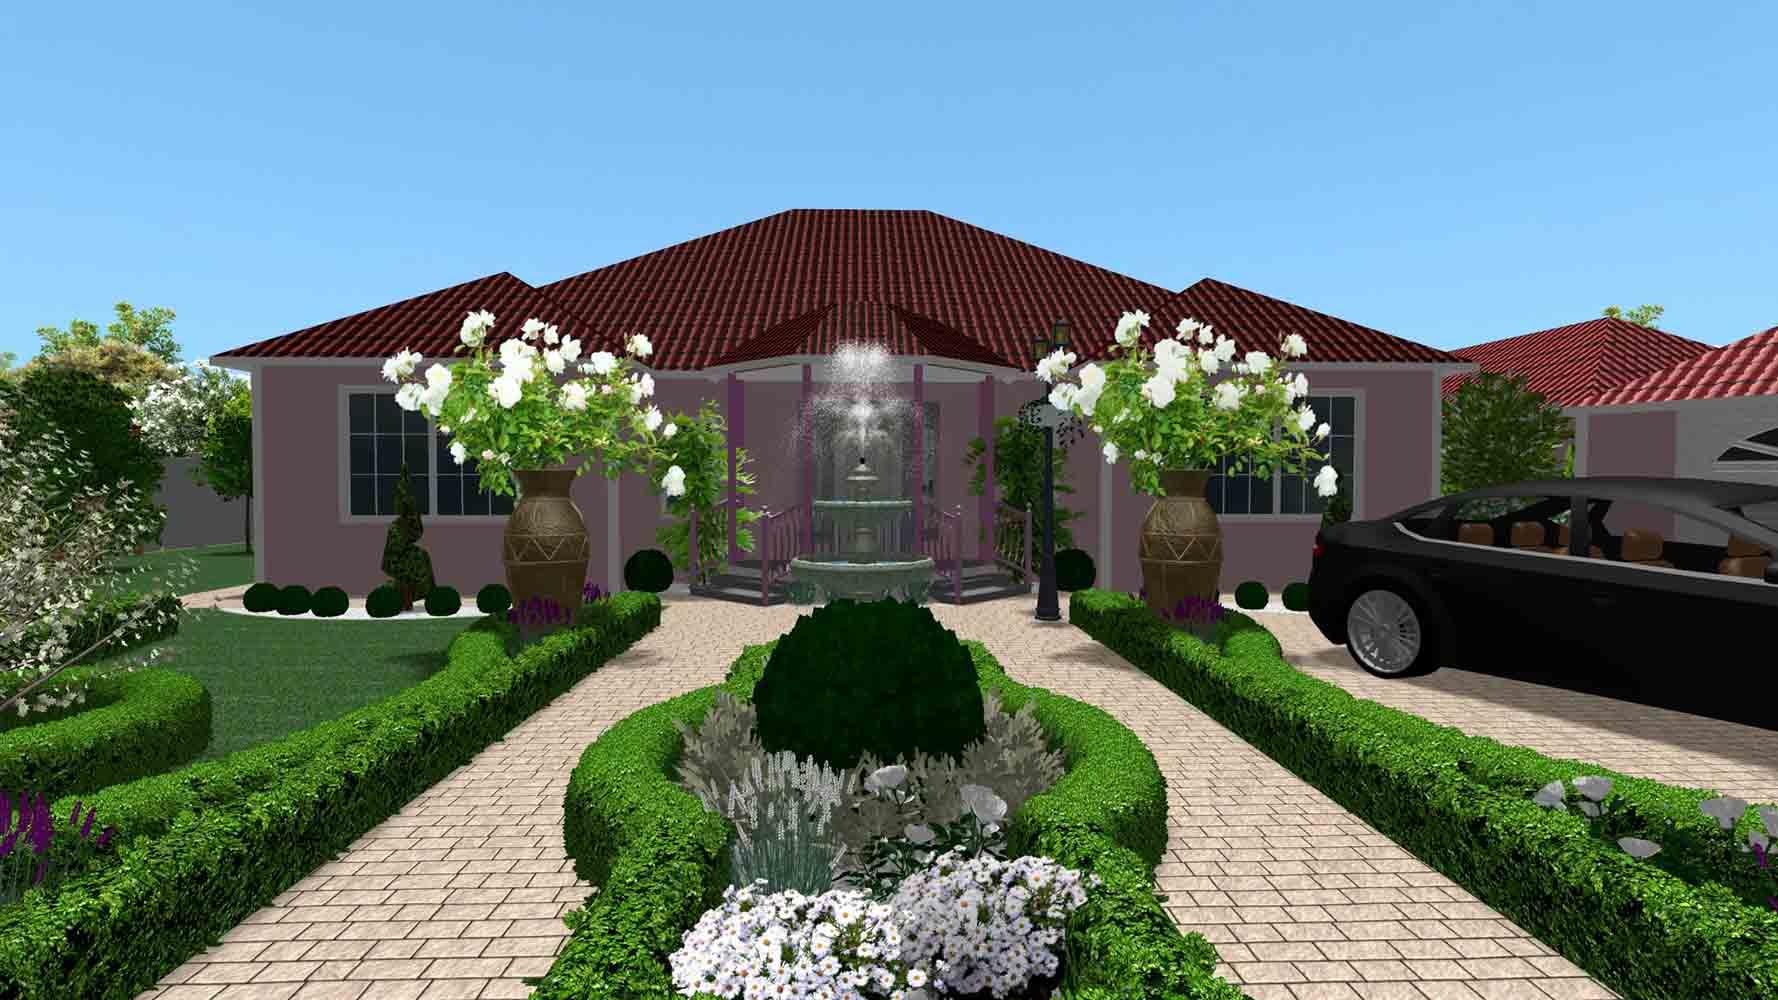 moroccan style garden by hedera 01 - 3D визуализация сада в марокканском стиле by Hedera